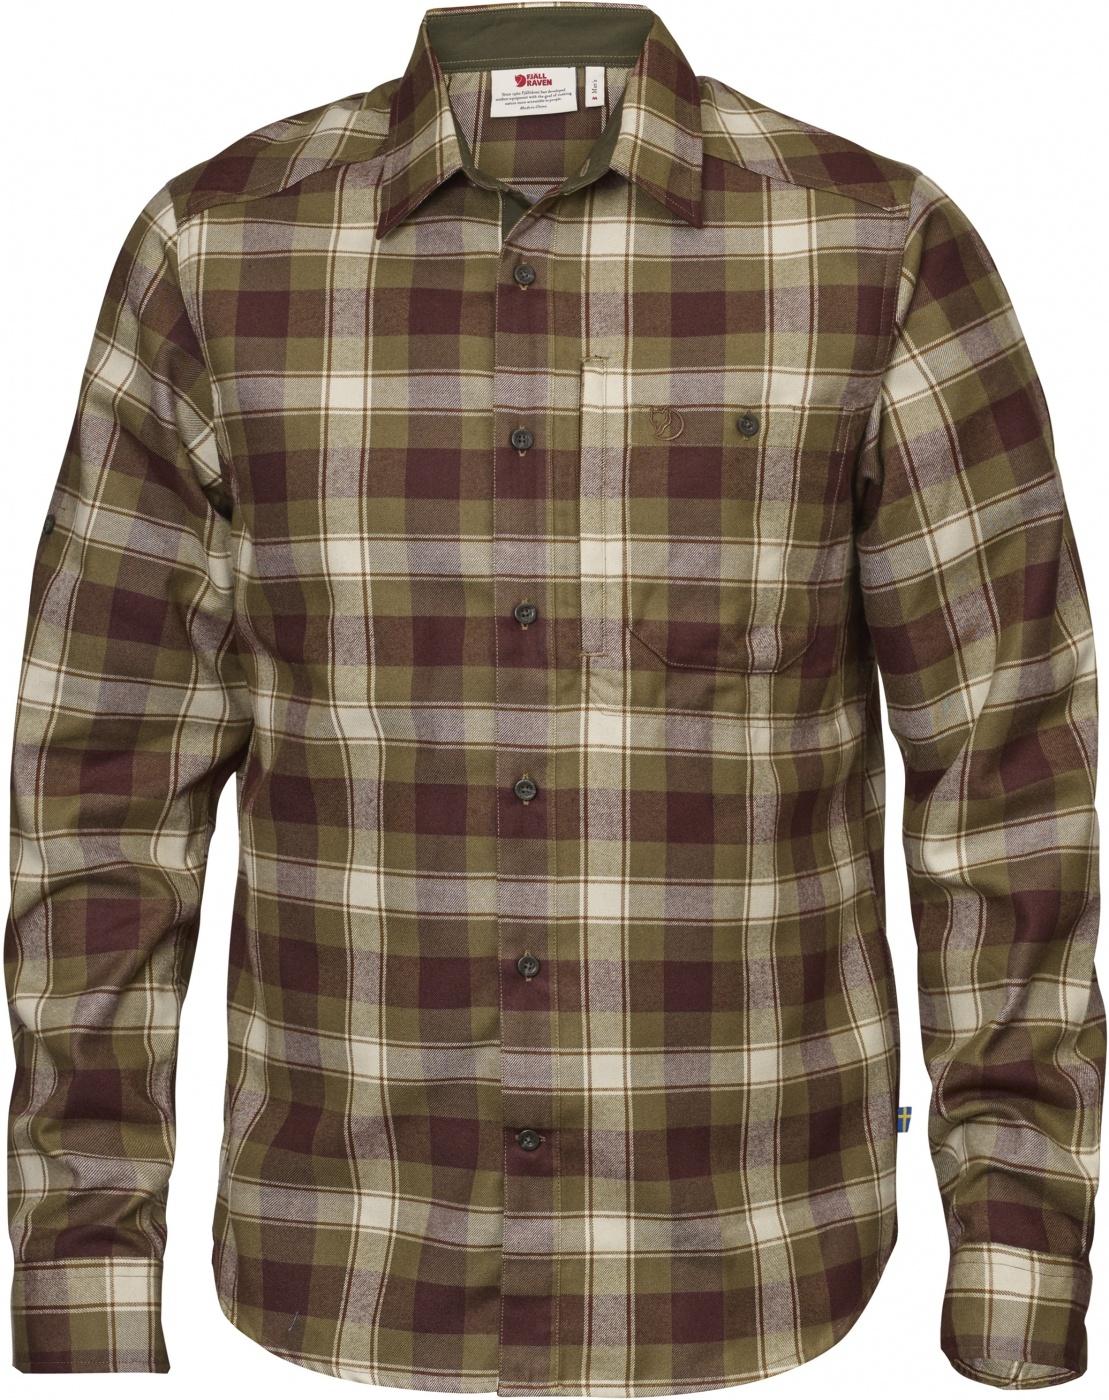 FjallRaven Fjällglim Shirt Khaki-30